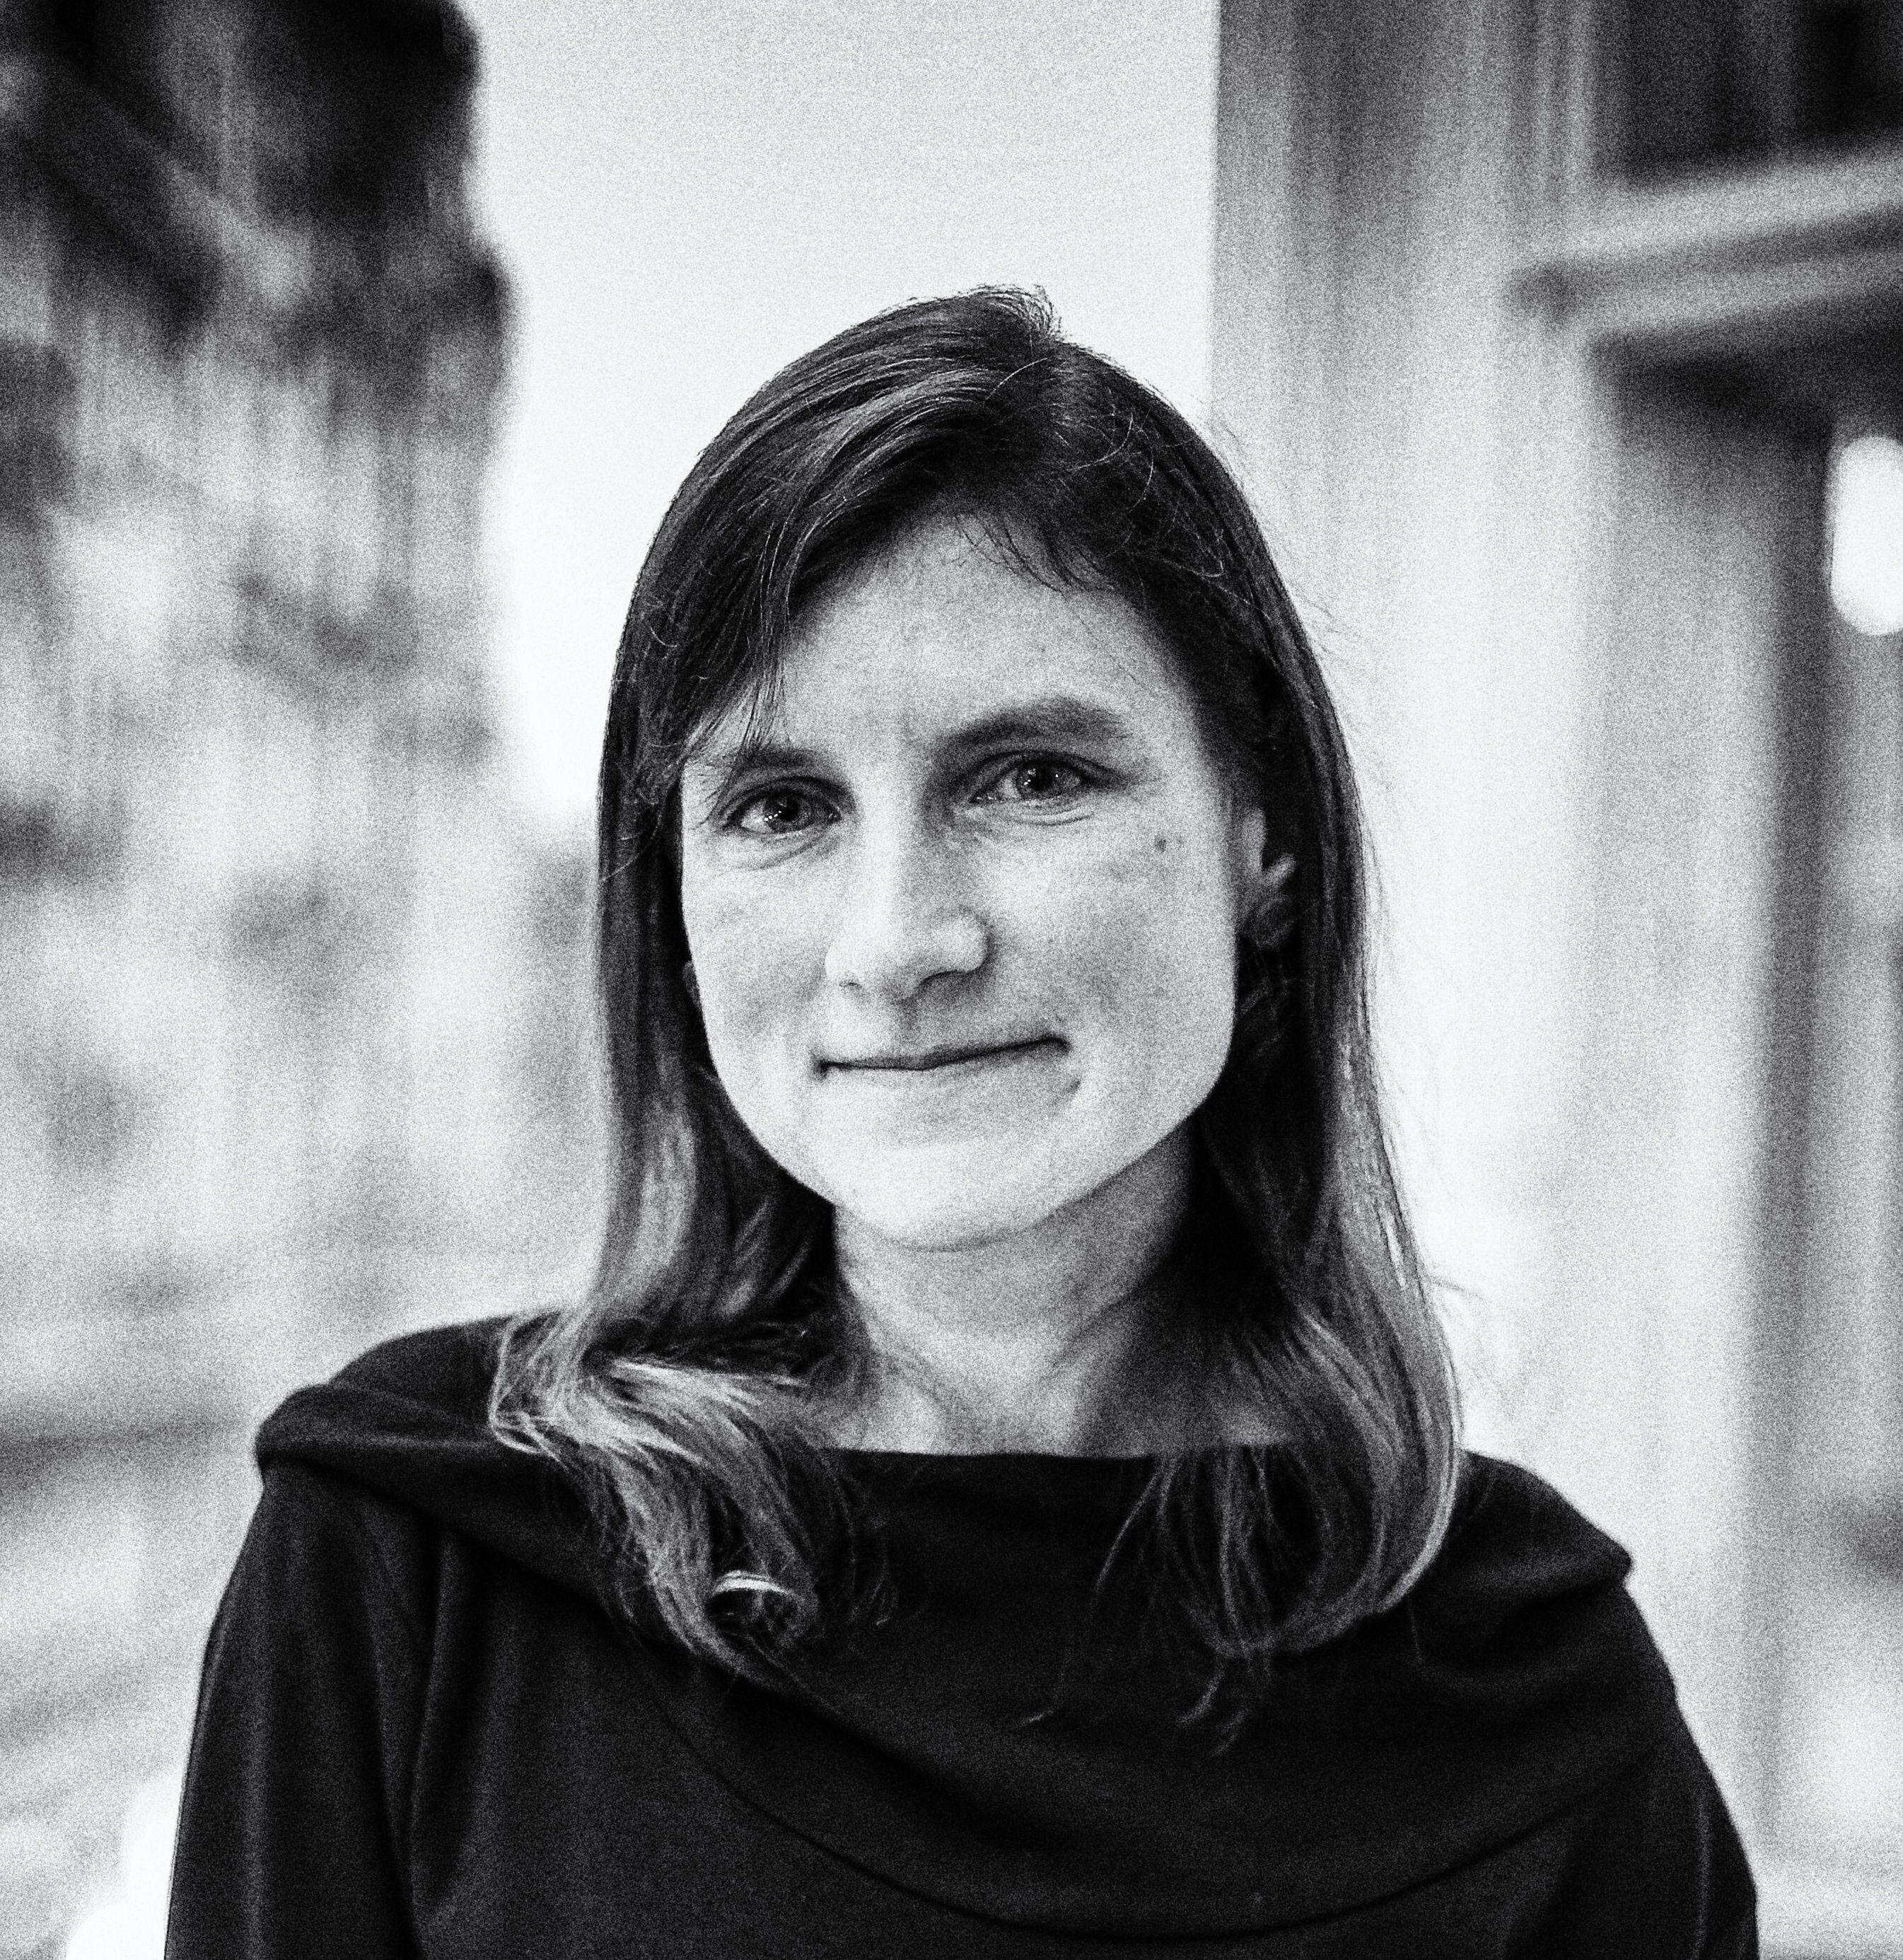 Marie Voslářová